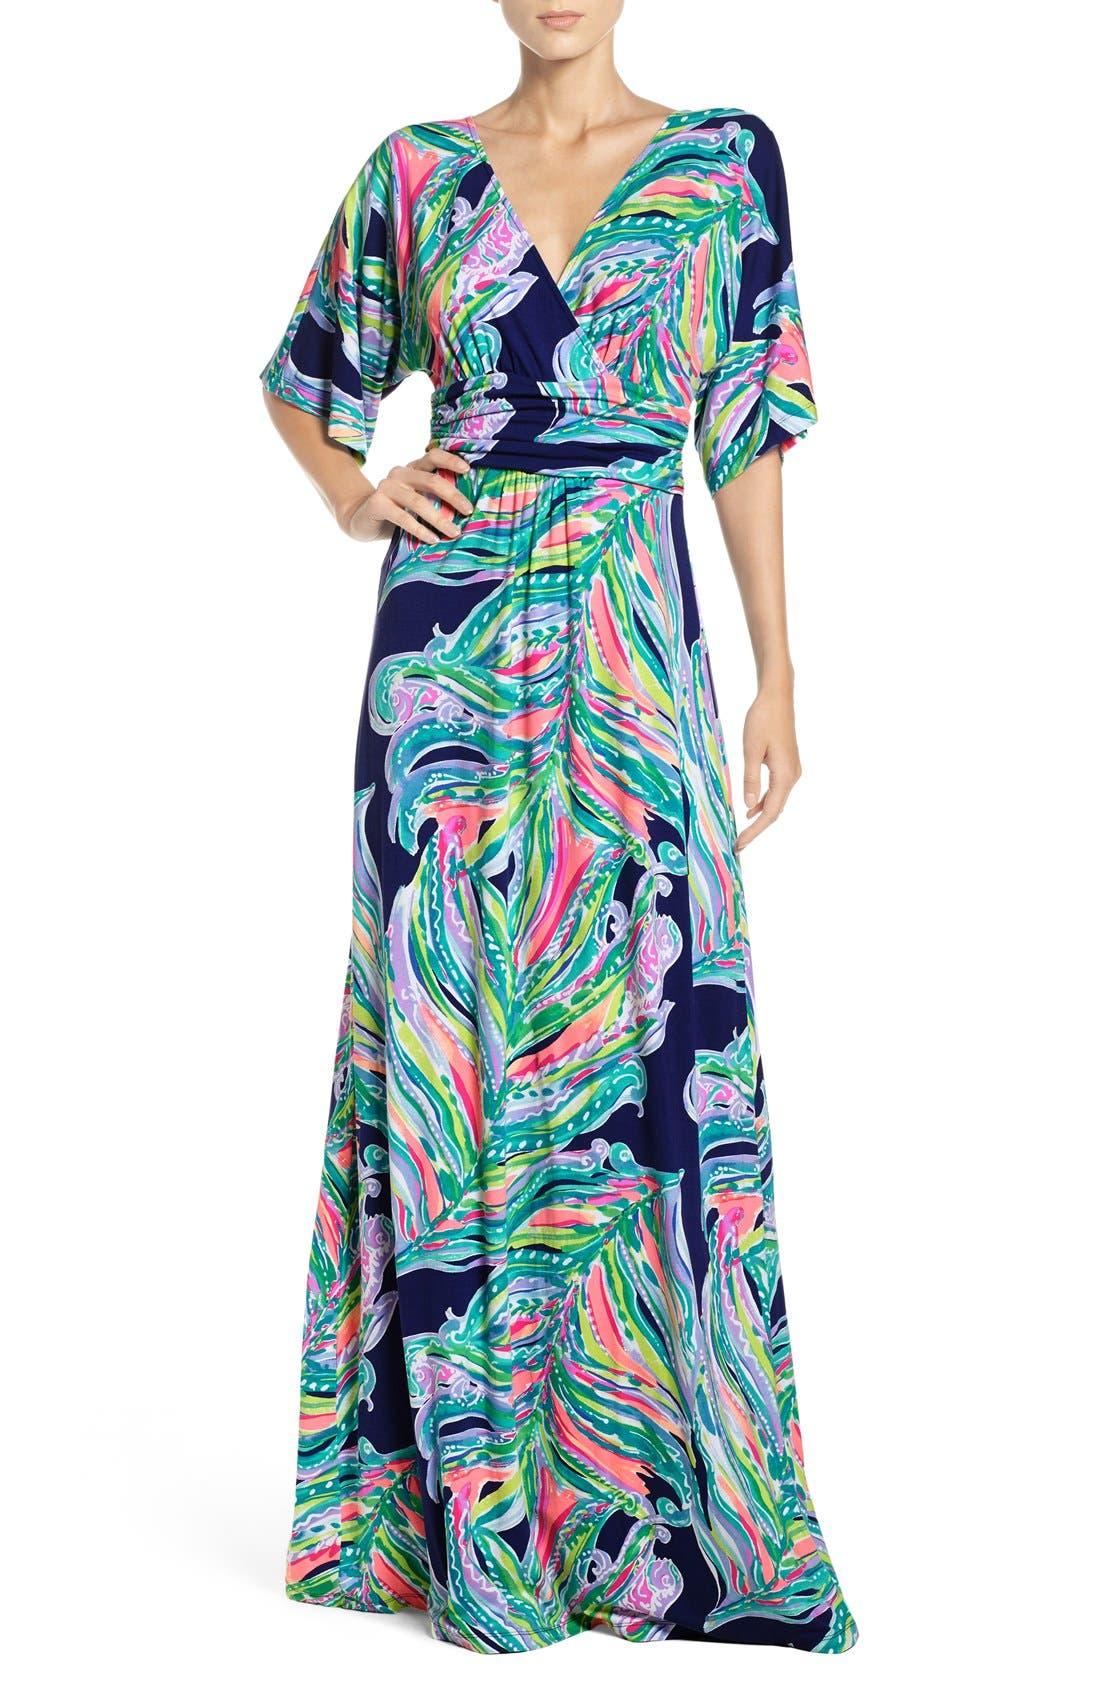 Alternate Image 1 Selected - Lilly Pulitzer® Parigi Maxi Dress